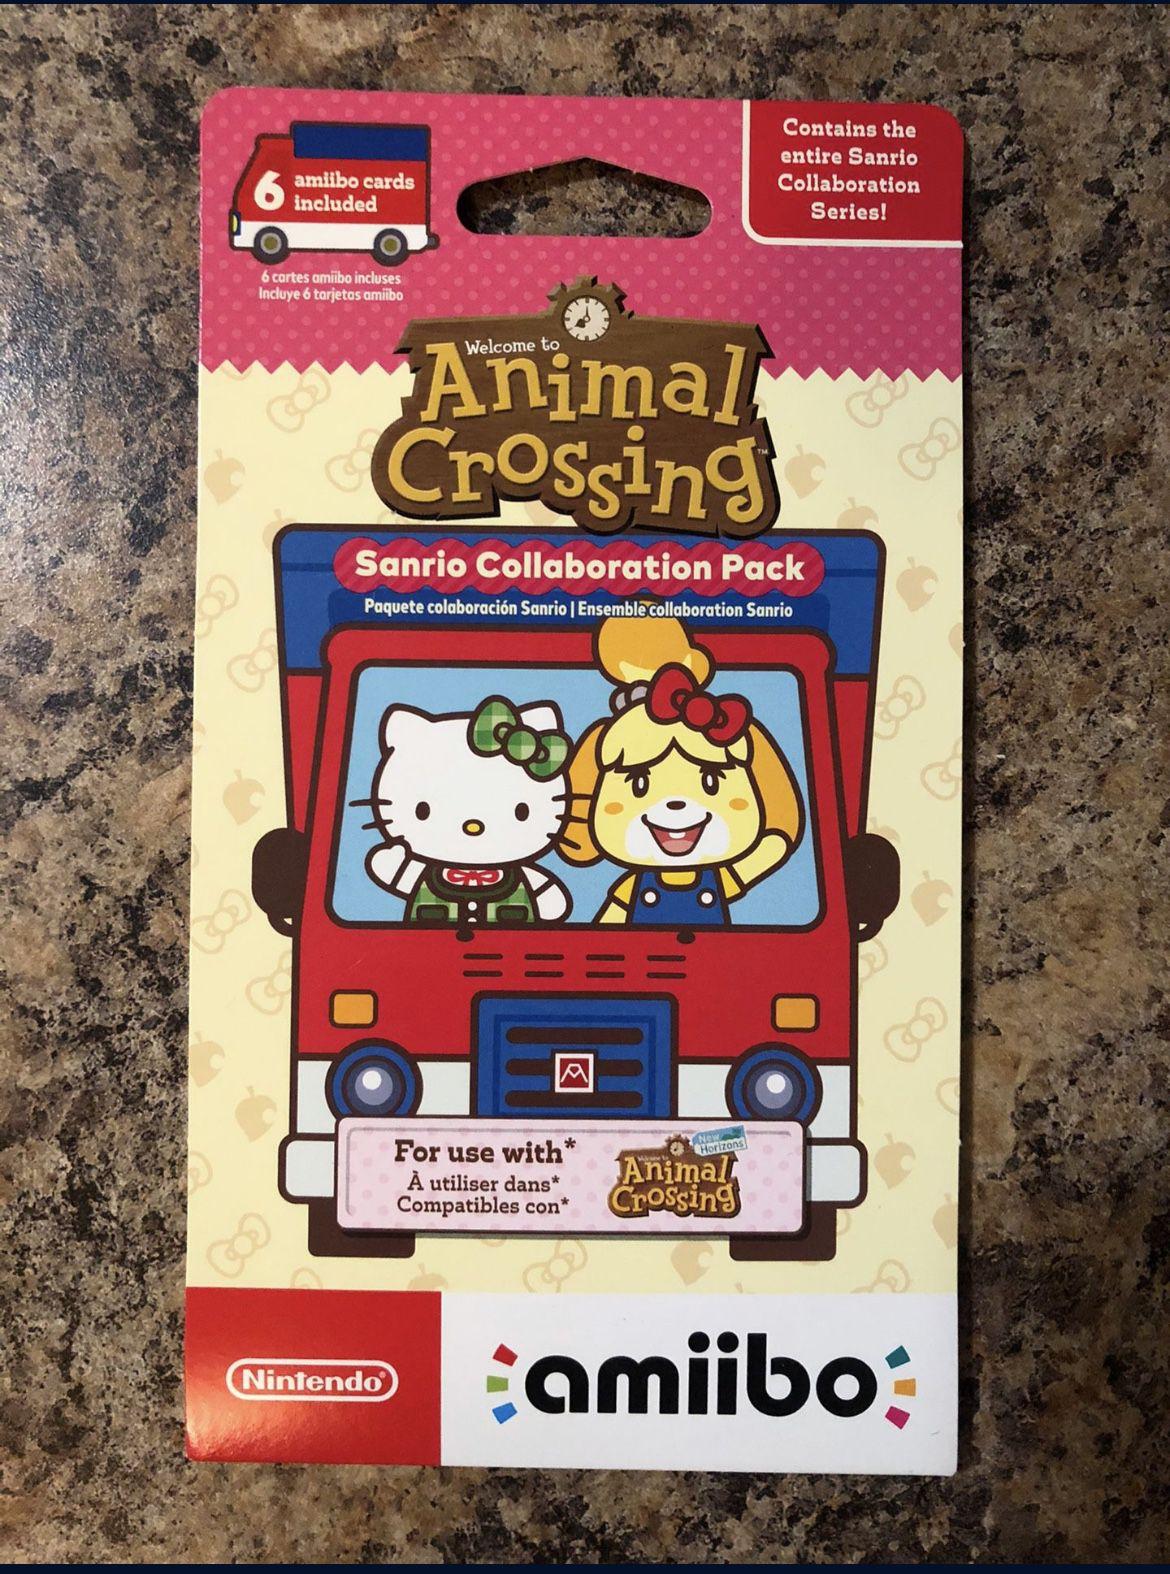 Animal crossings Amiibo Cards